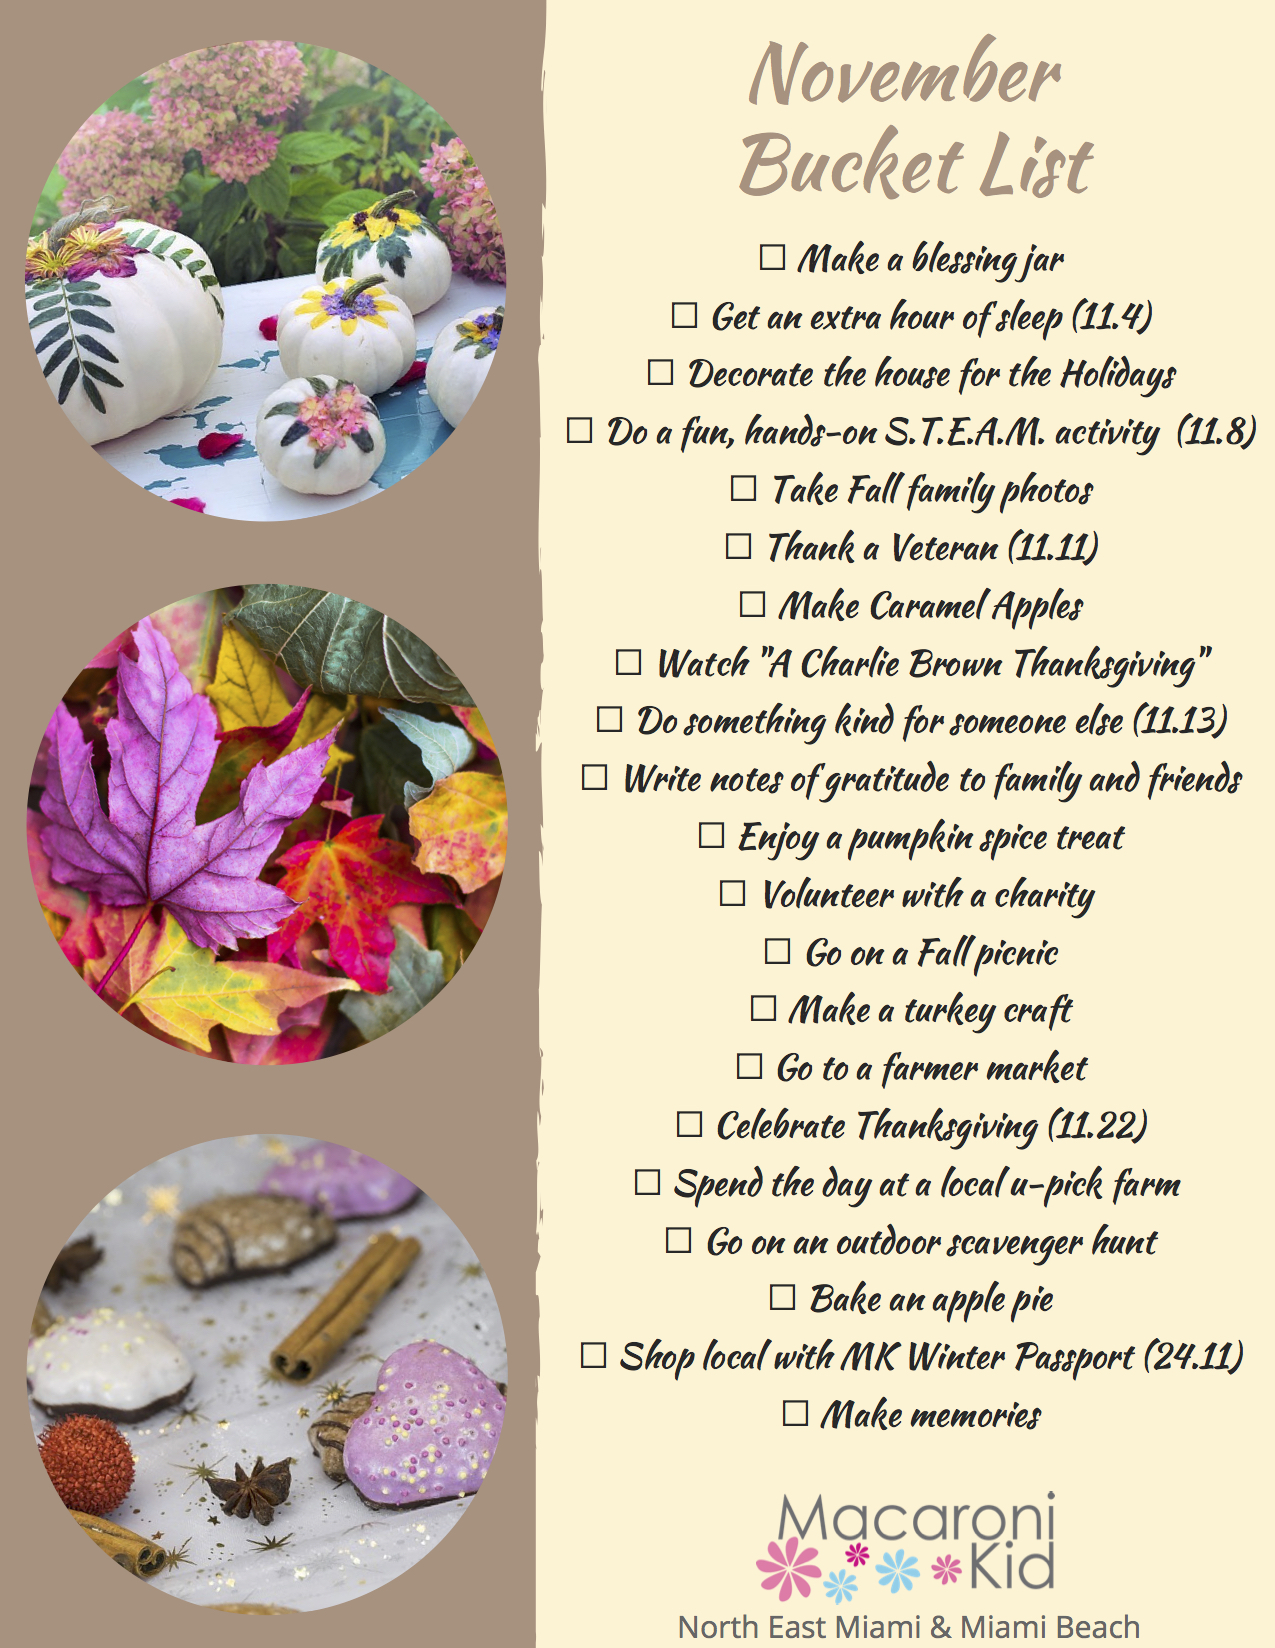 Free Printable November Bucket List Macaroni Kid Miami North East Miami Beach